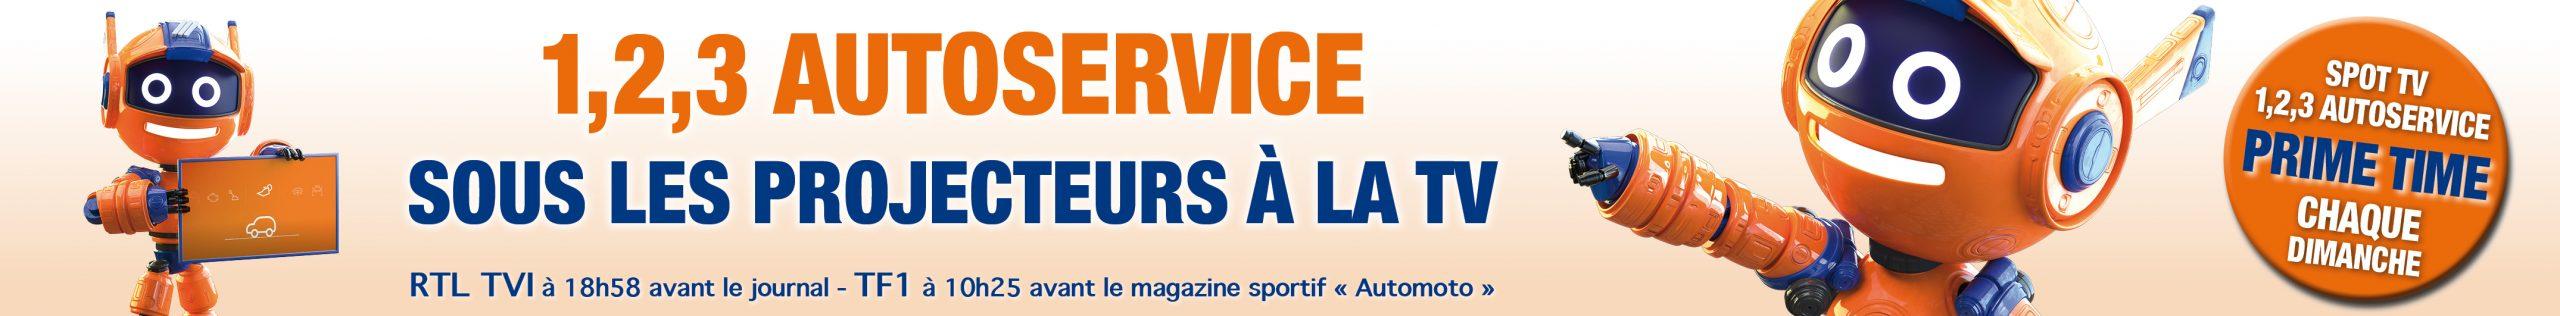 1,2,3 AutoService : Information